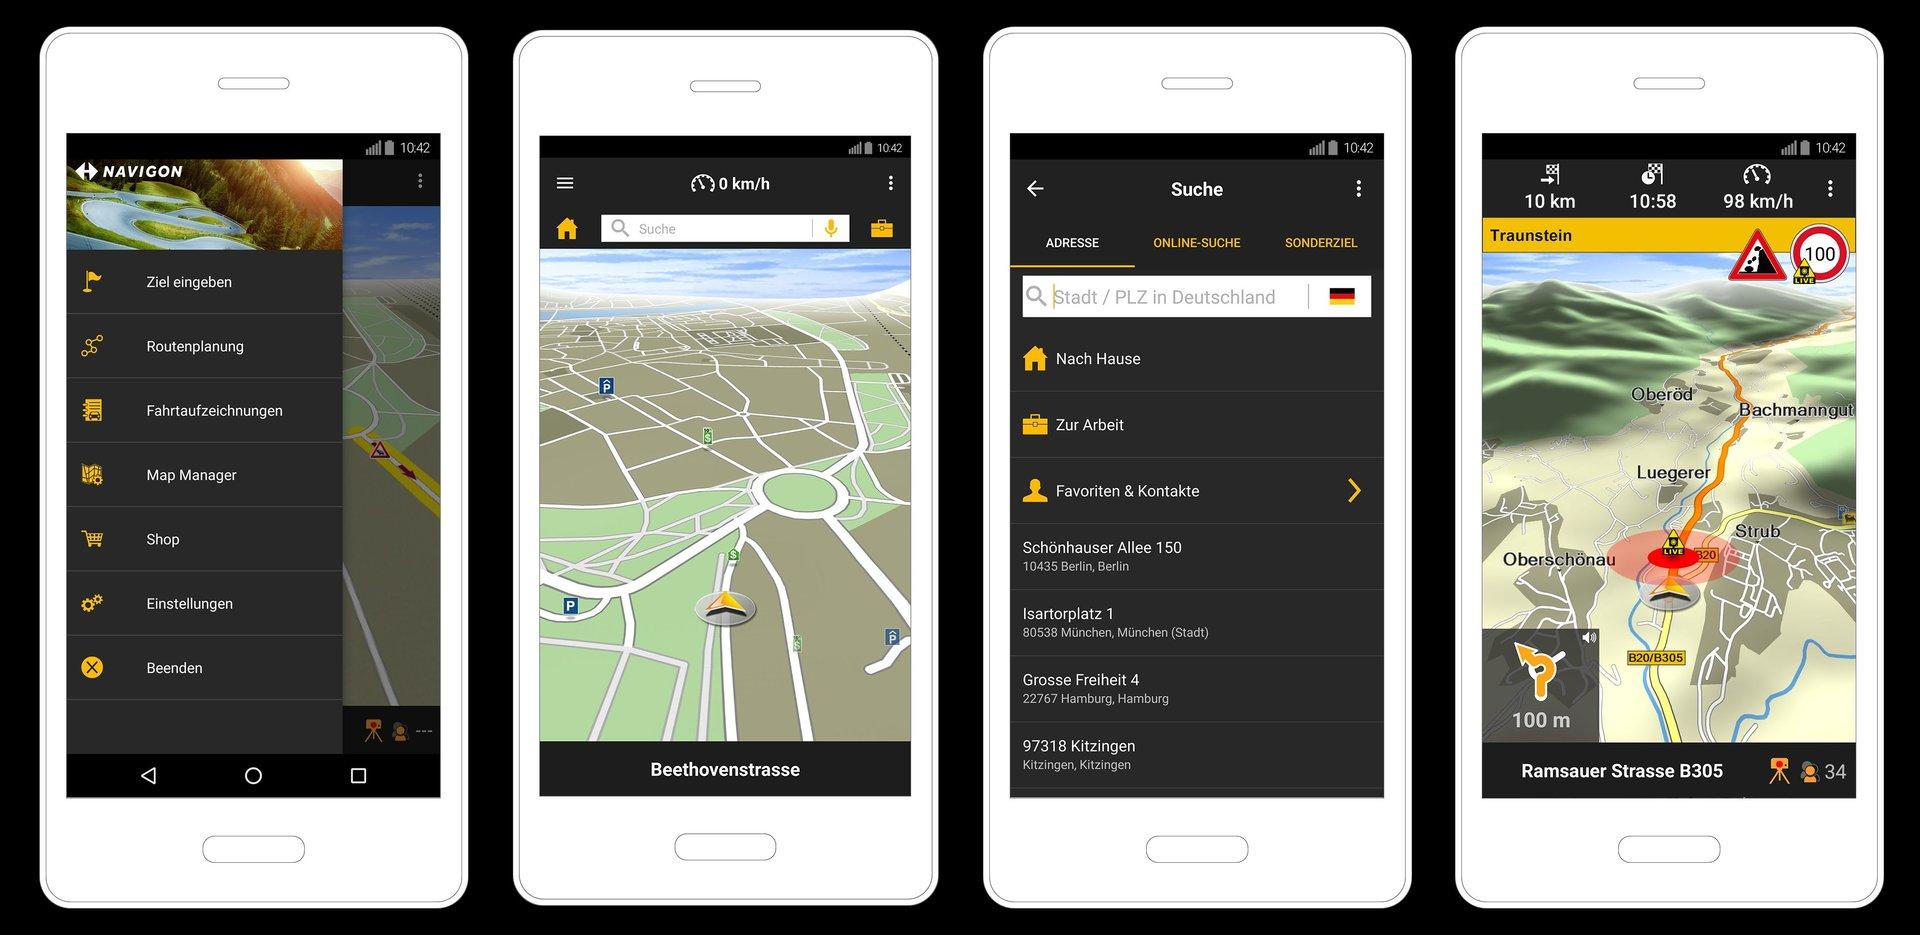 Das neue Garmin Navigon für Android